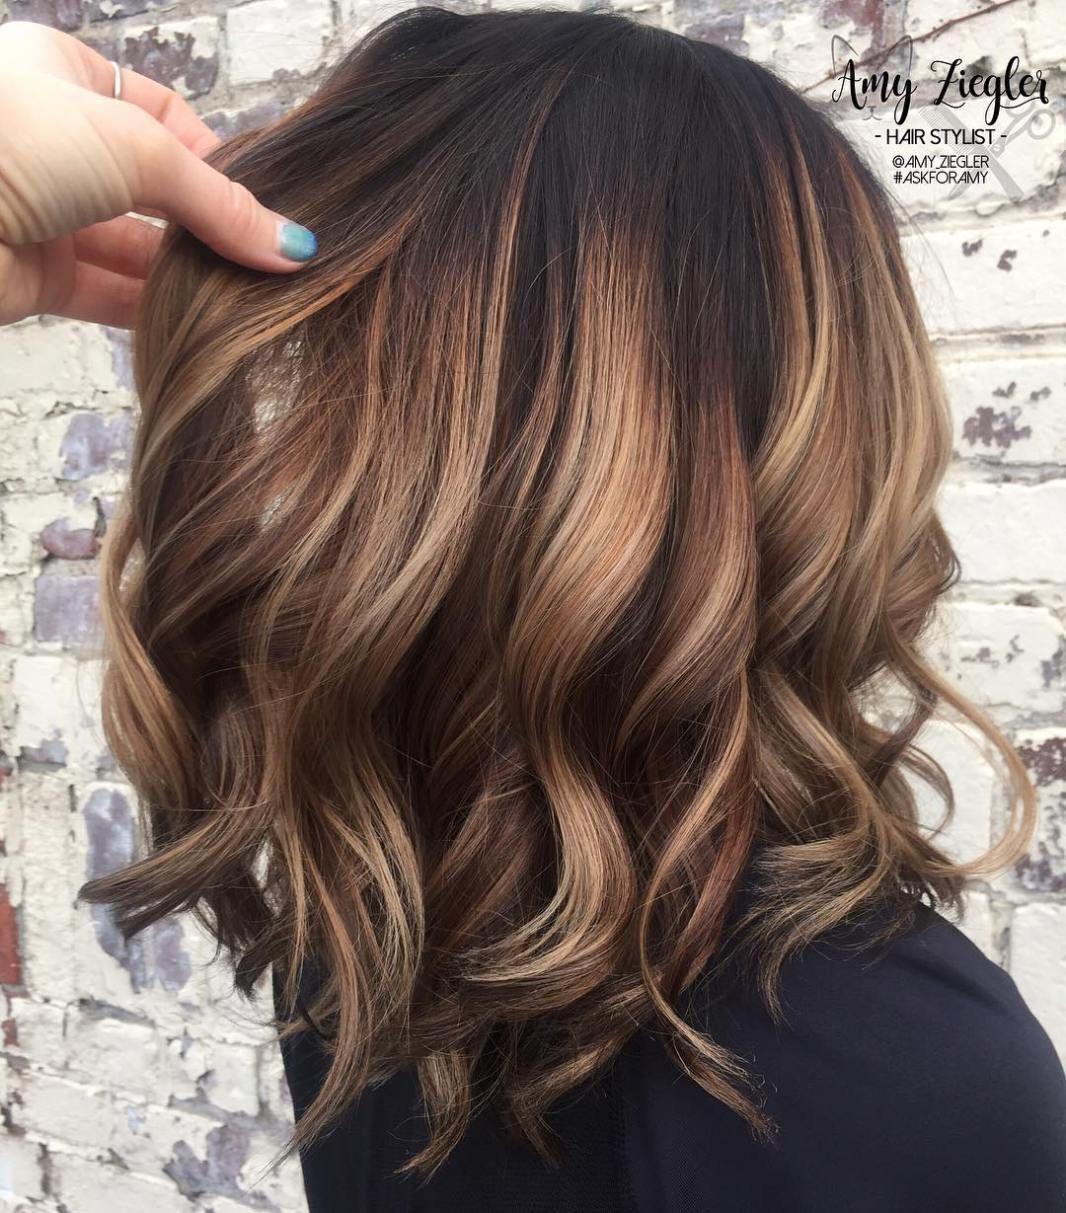 70 Flattering Balayage Hair Color Ideas For 2020 Hair Styles Brown Hair Balayage Medium Hair Styles